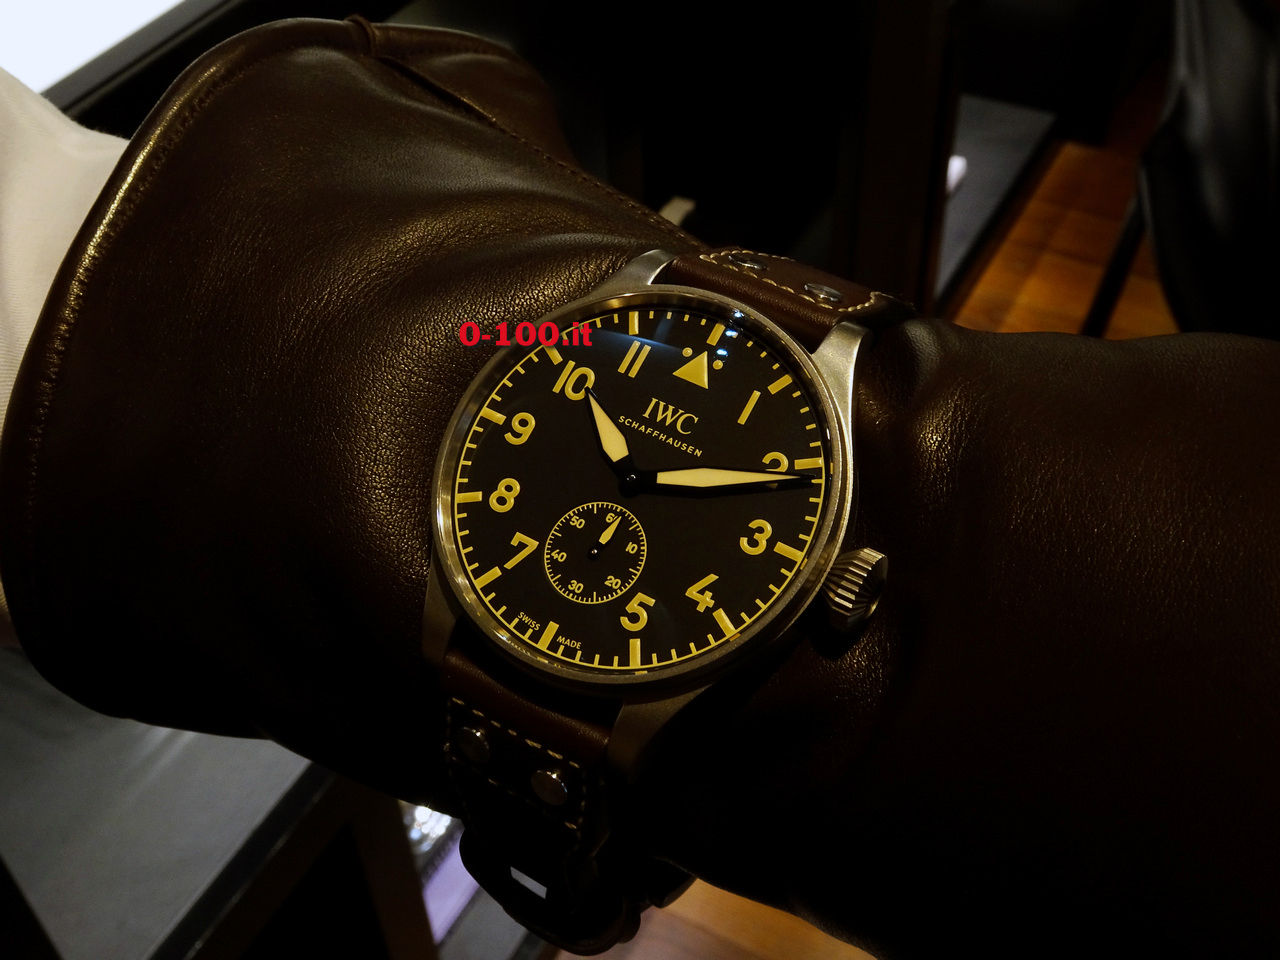 IWC_pilot_heritage-55-prezzo-price-0-100_6